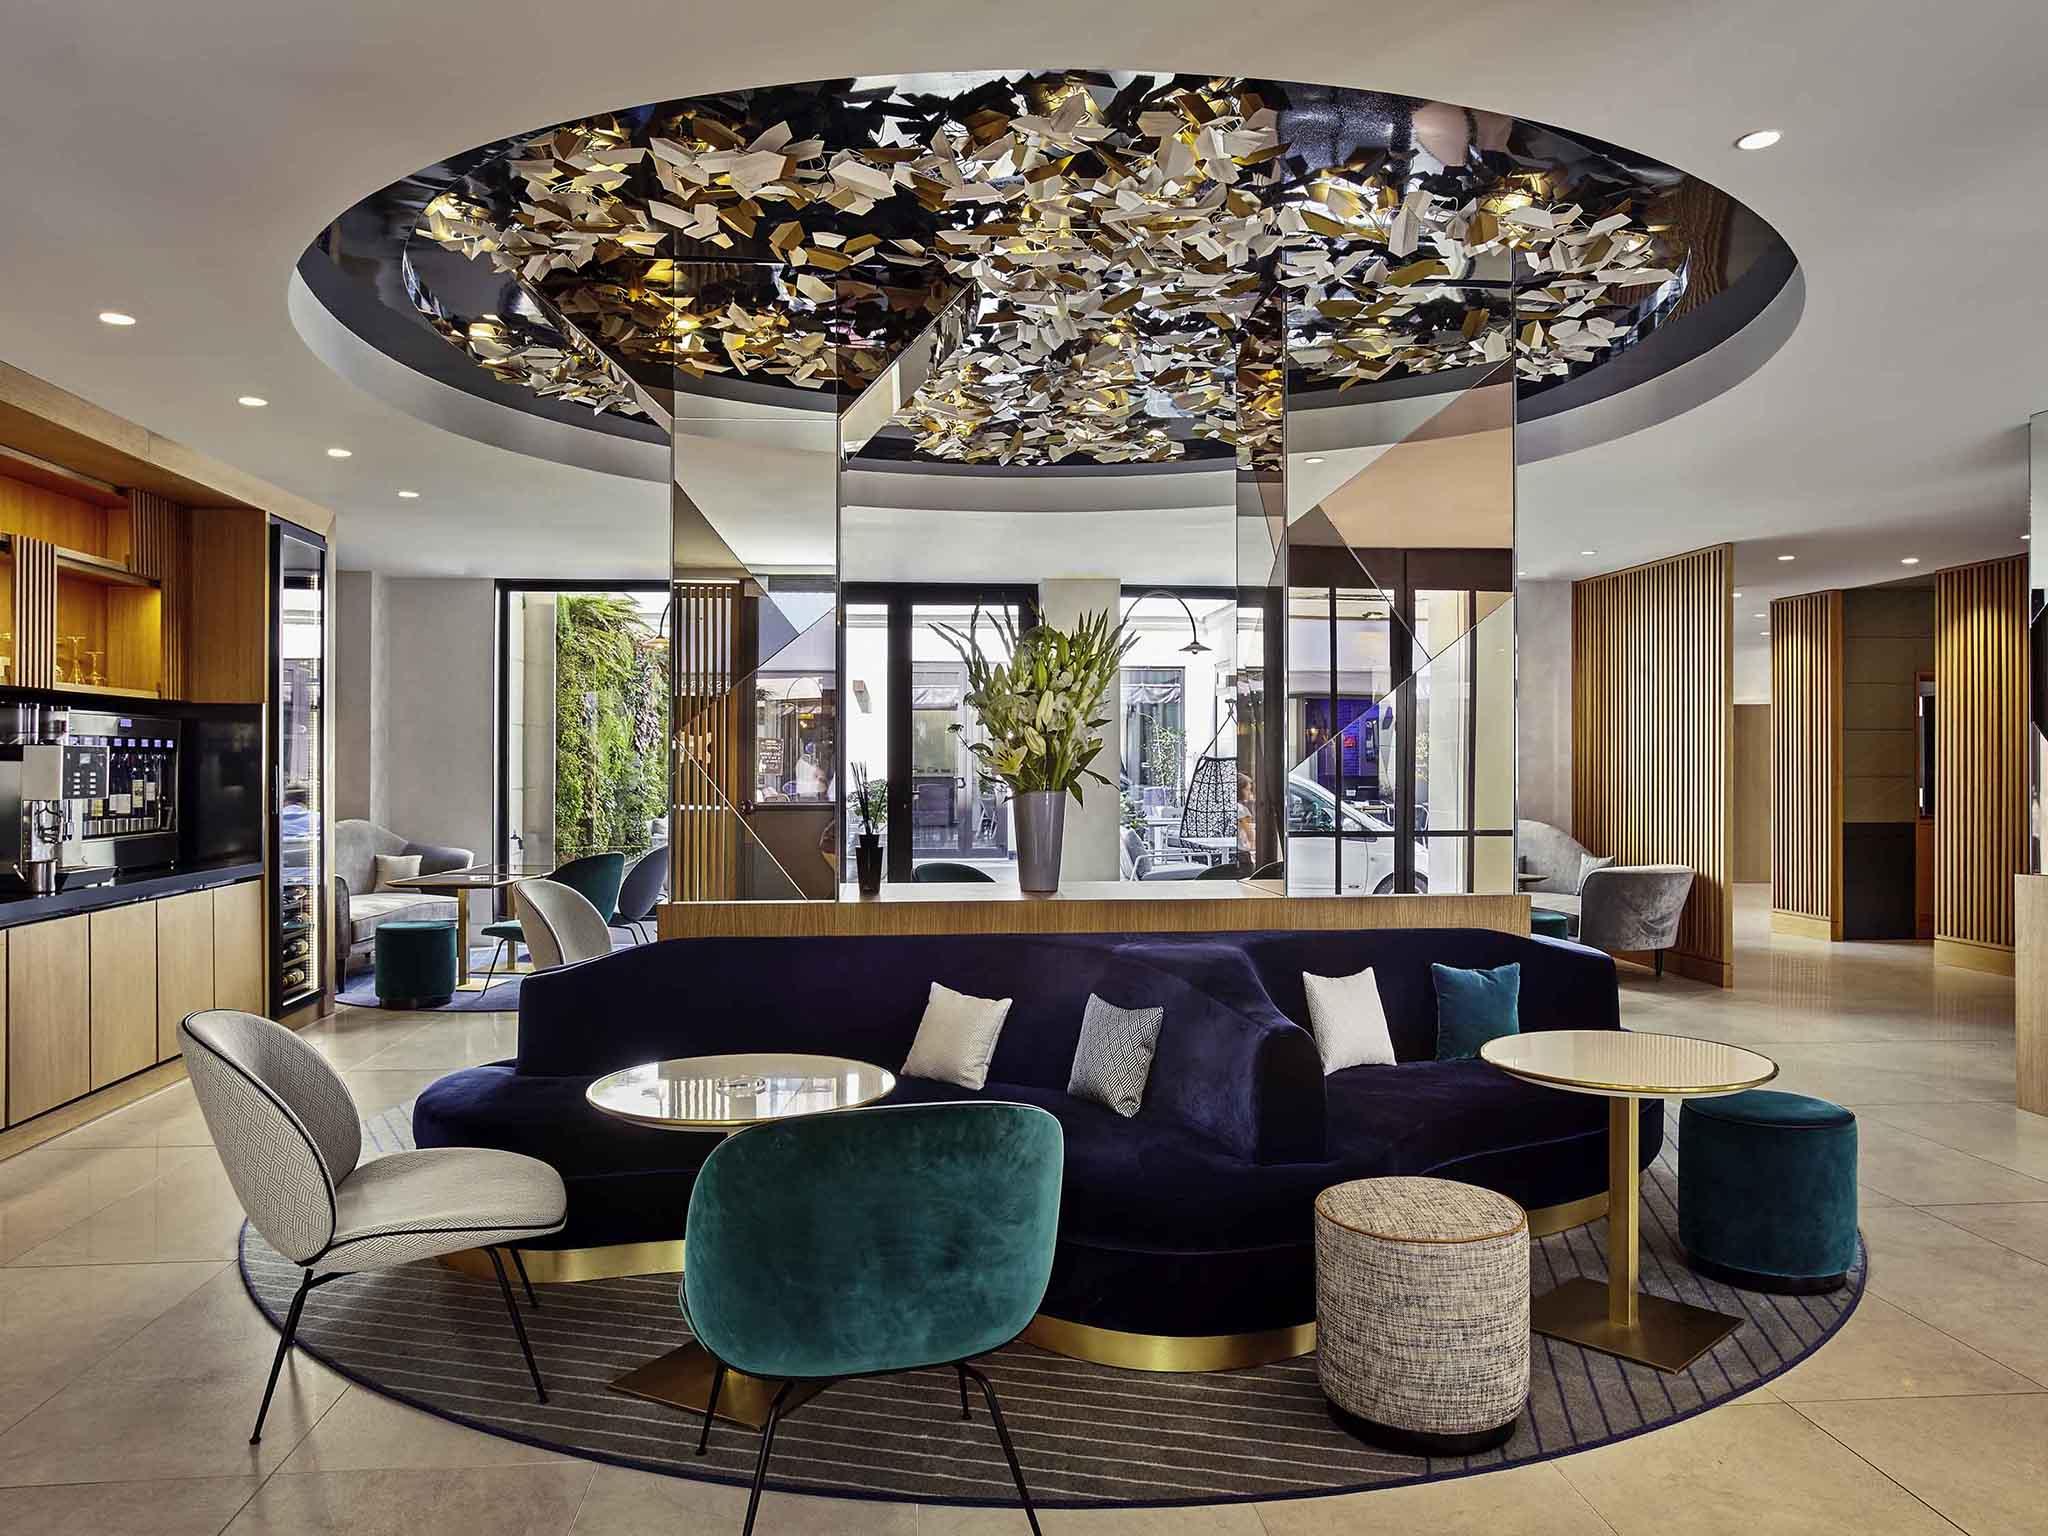 Hotel – Hotel Mercure París Opera Garnier